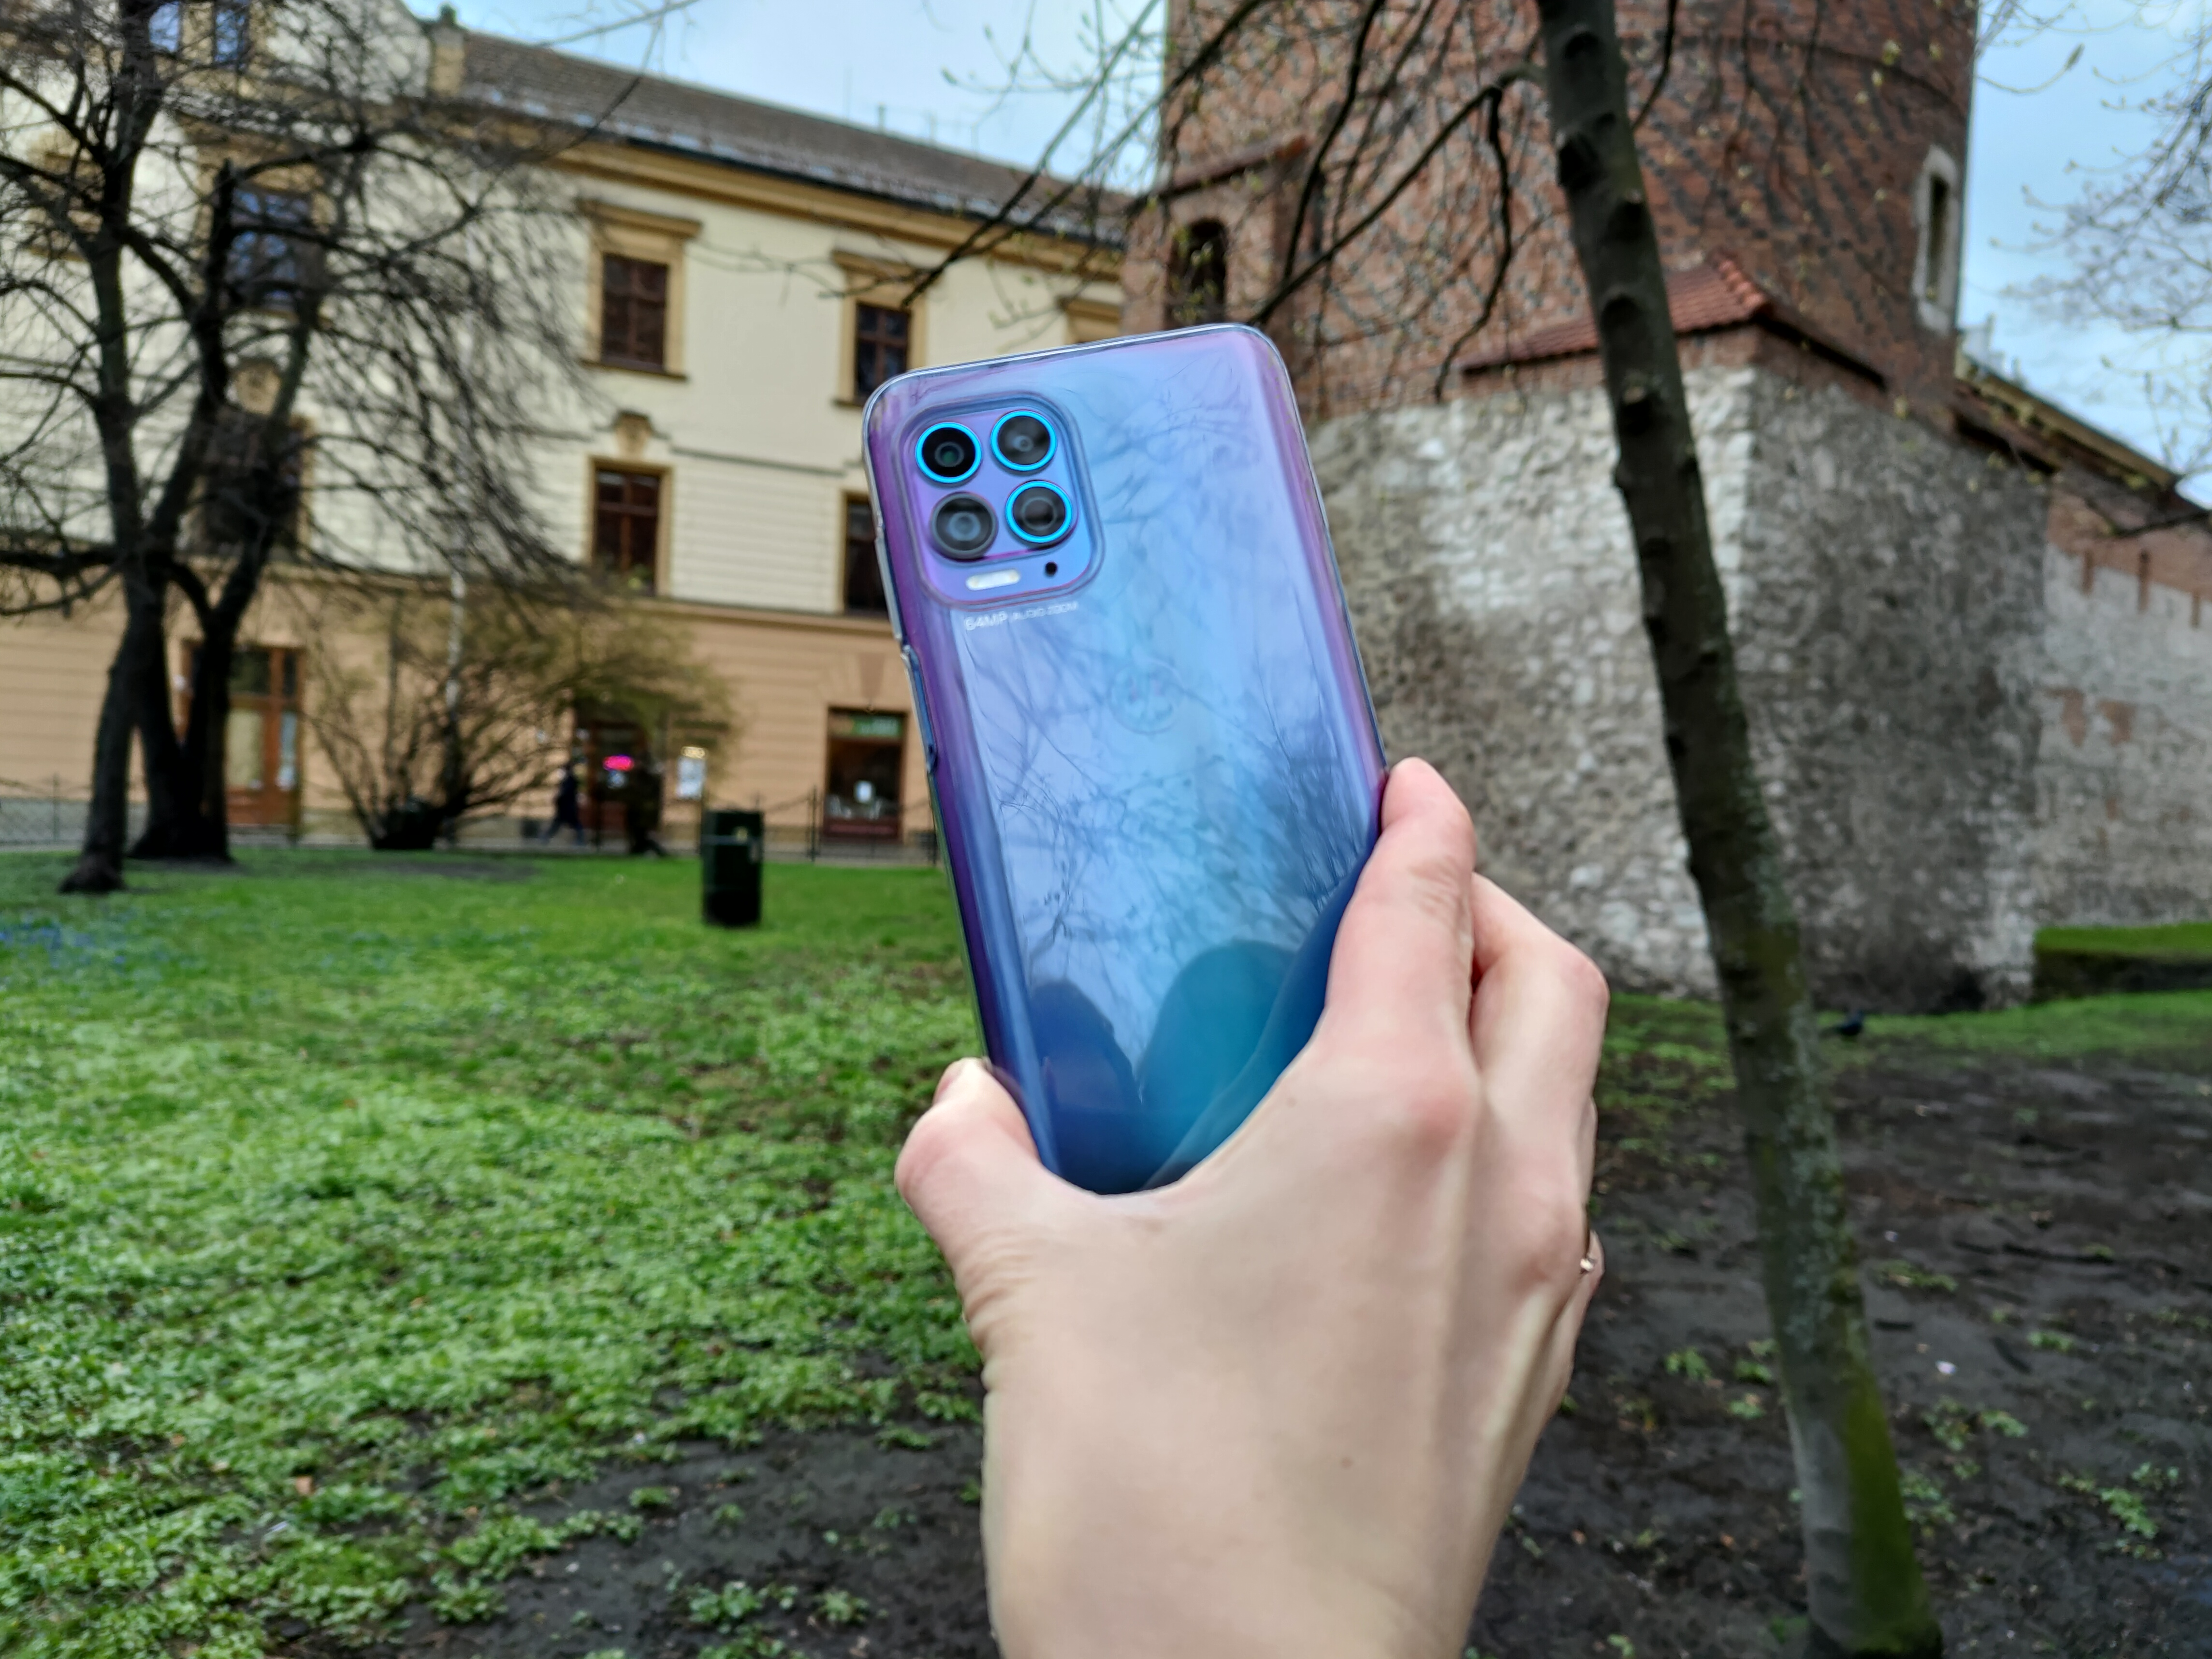 Recenzja Motorola moto g100 - Zestawowe etui - fot. Tabletowo.pl